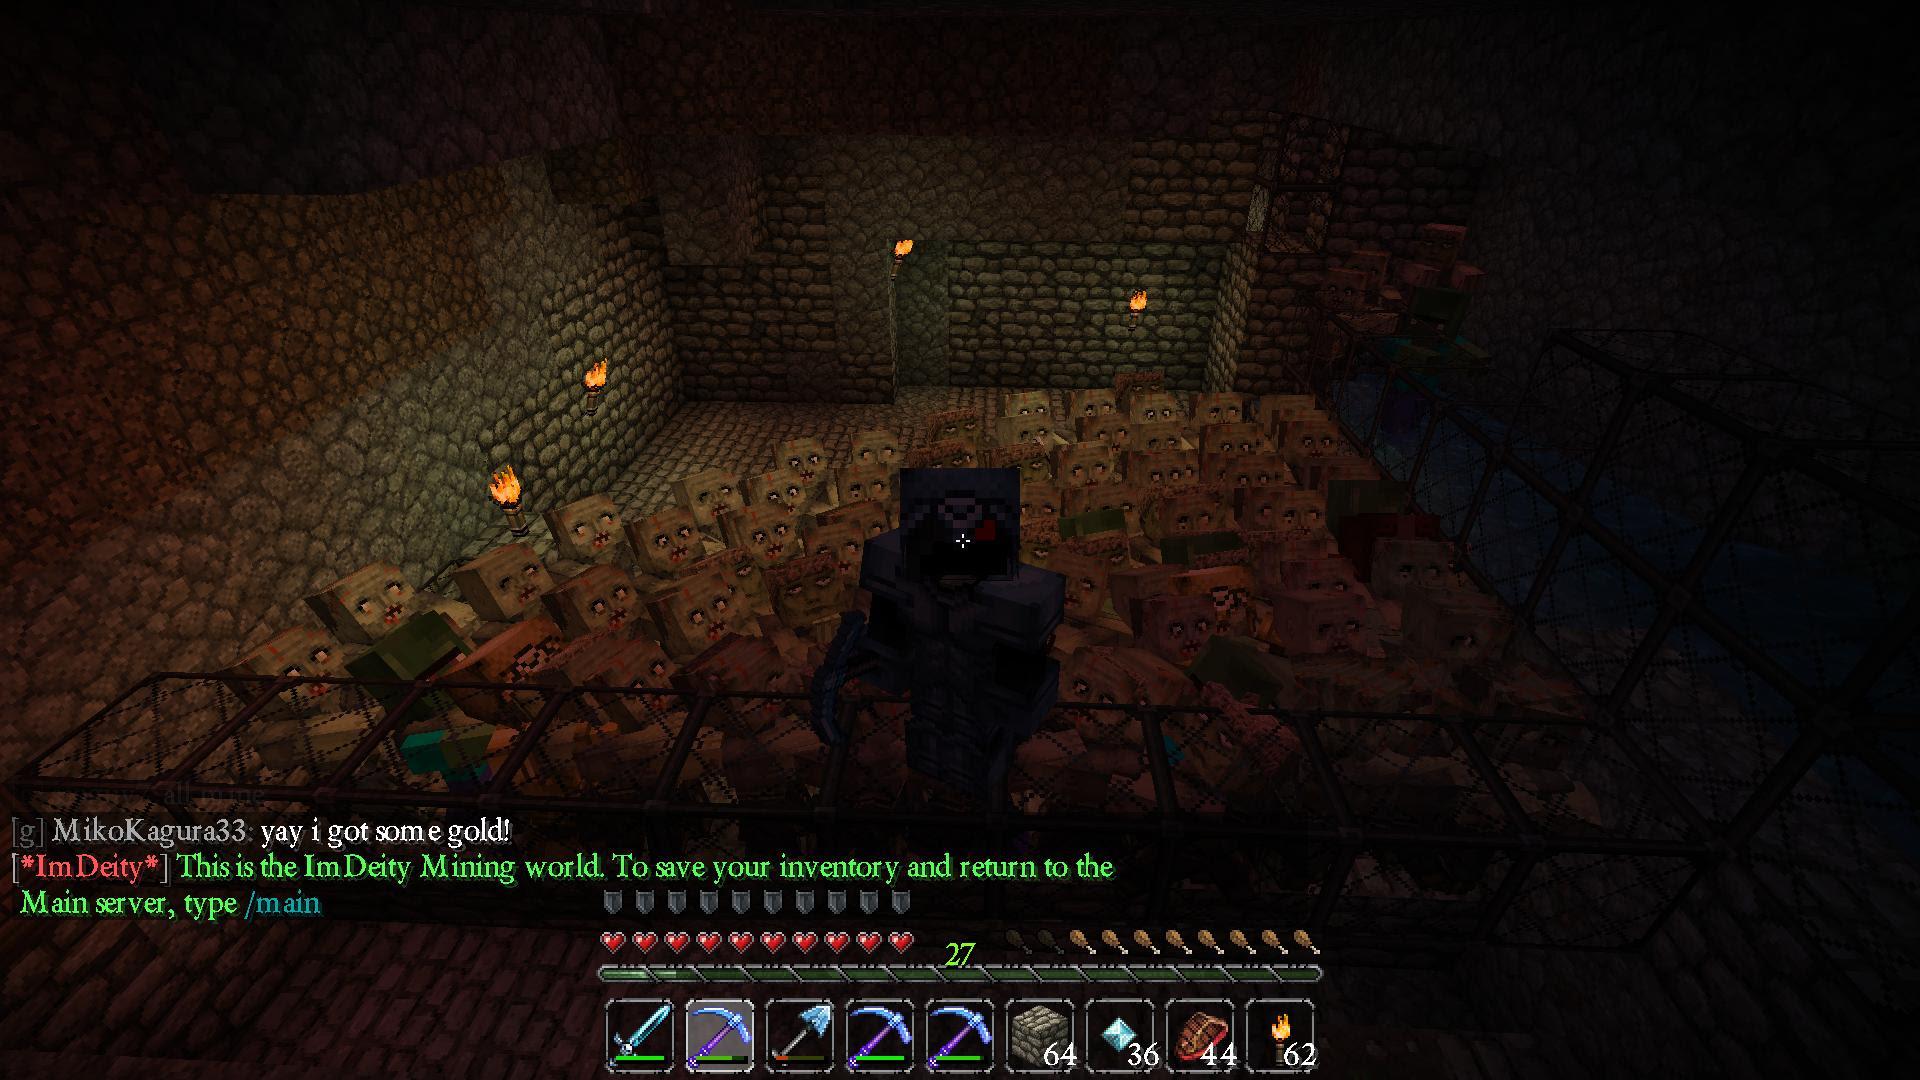 House Of 1000 Corpses Imdeity Kingdoms Minecraft Multiplayer